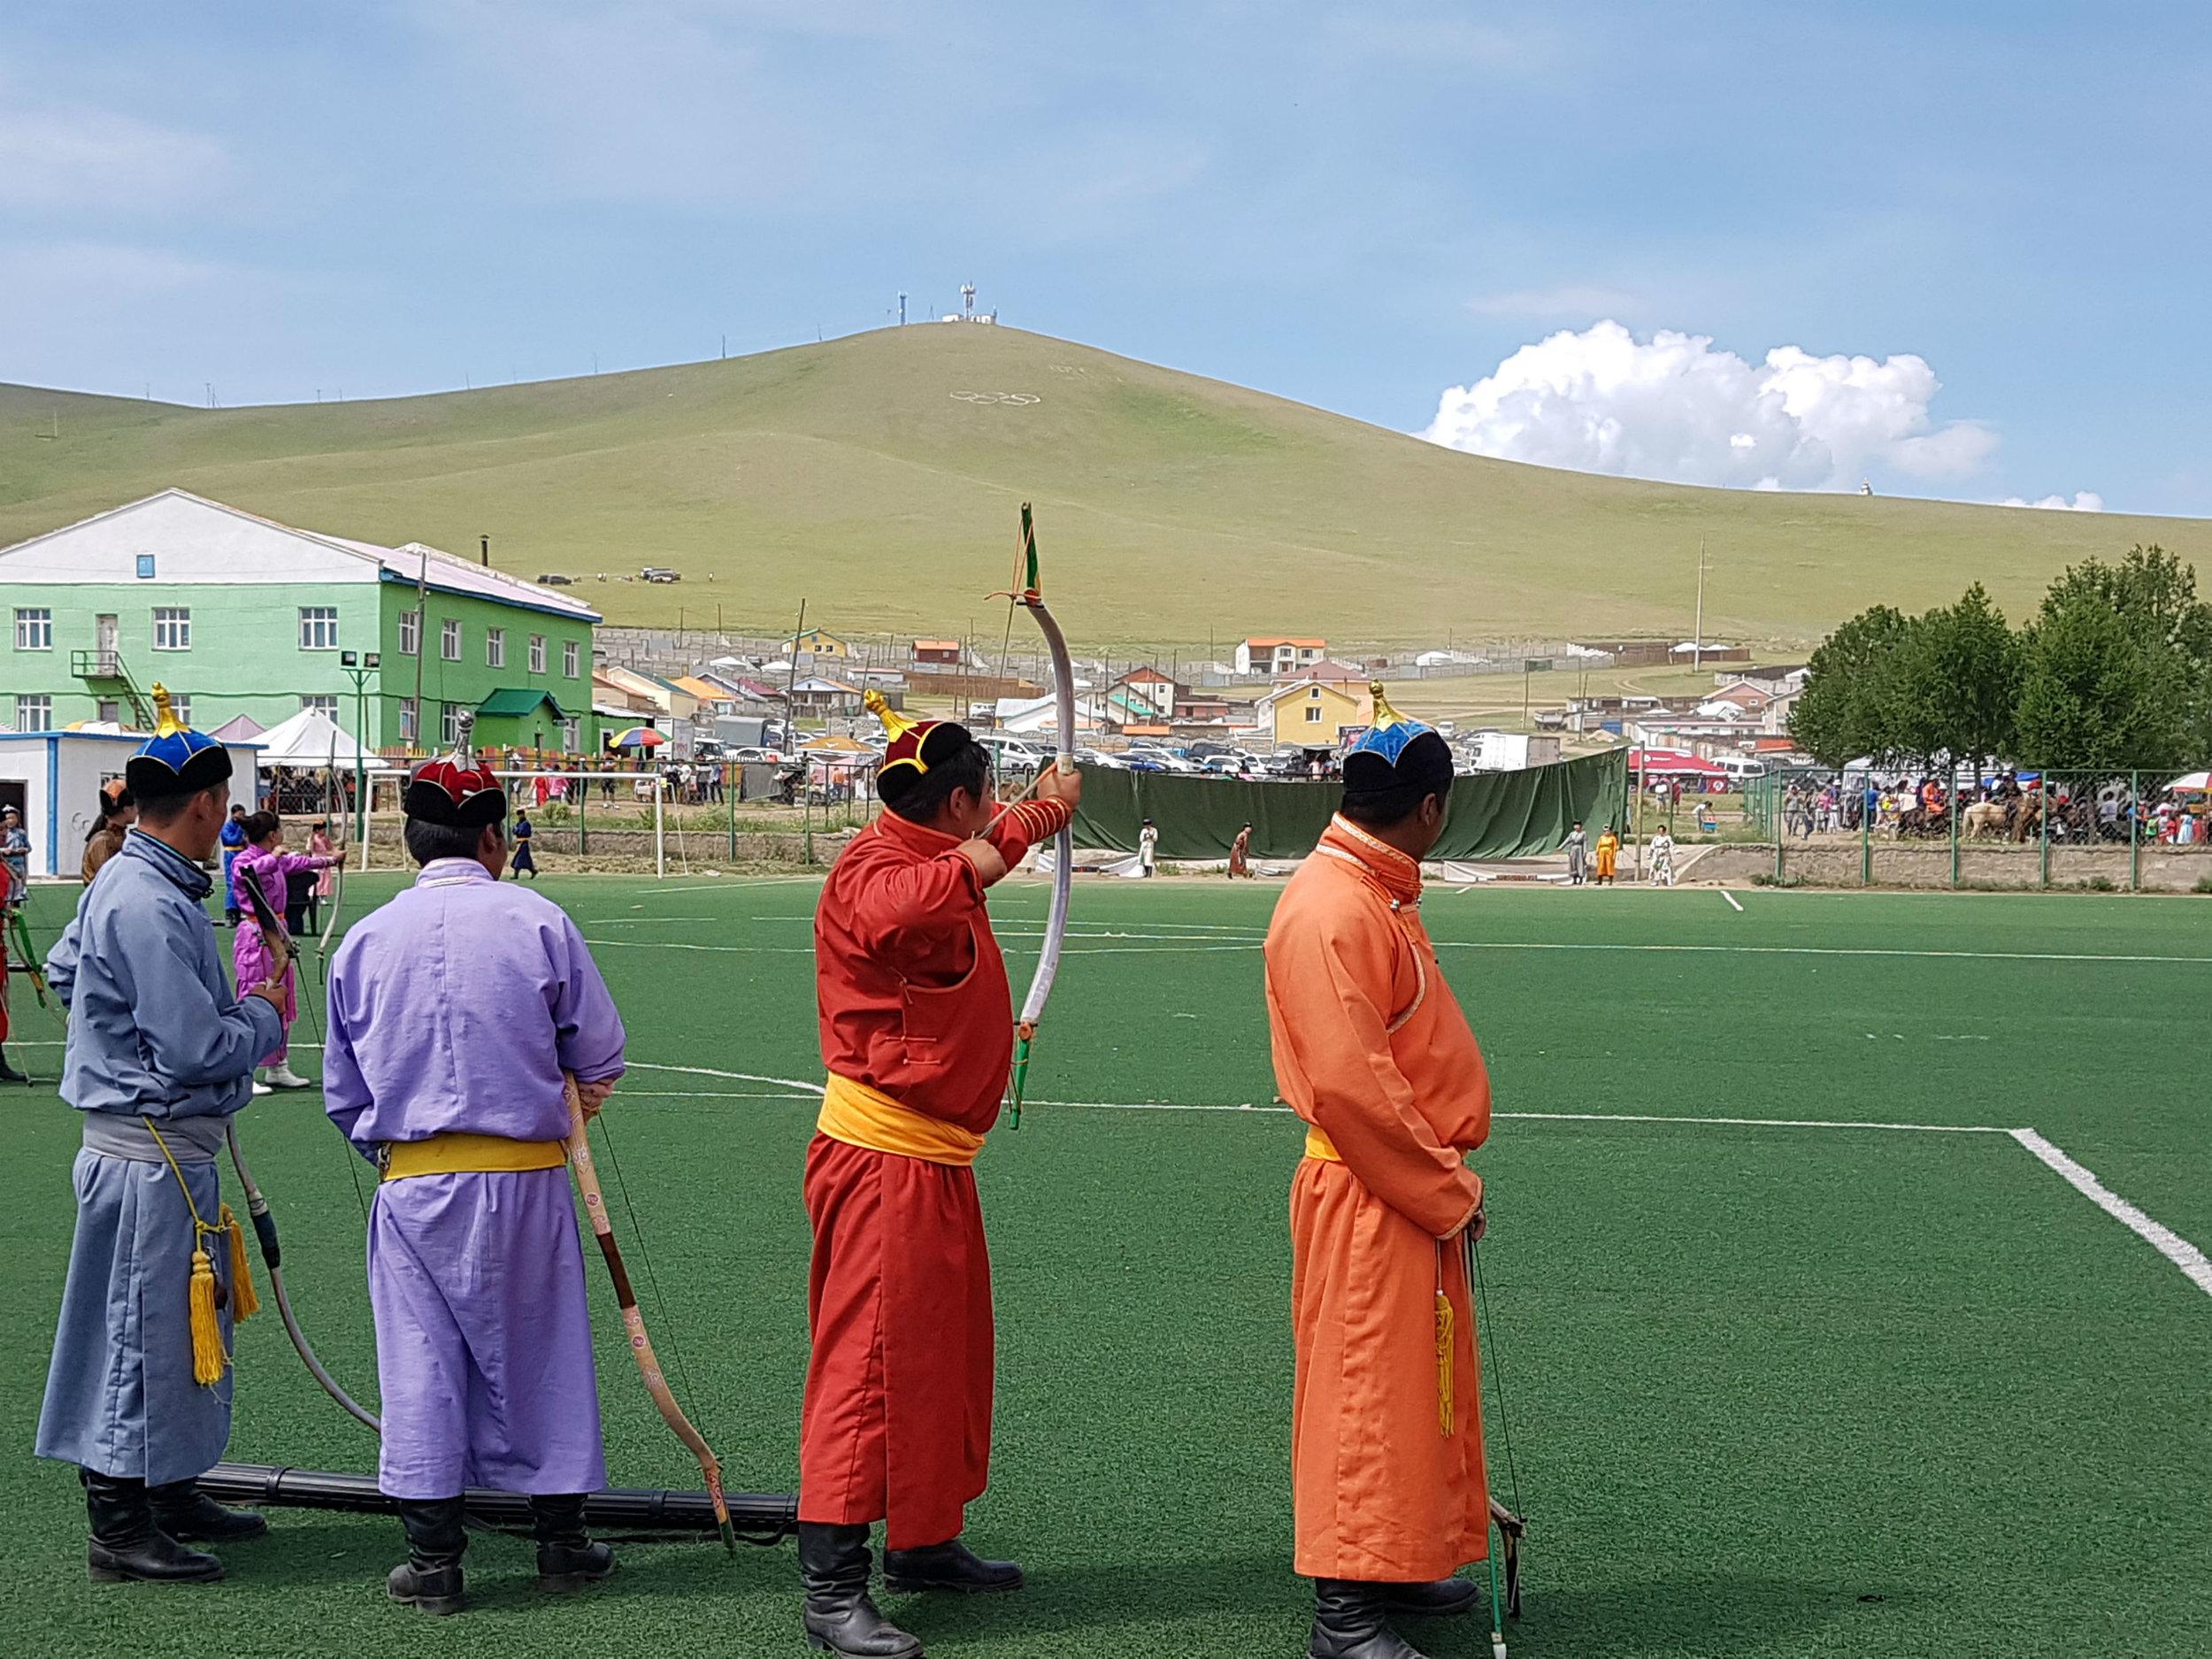 Archery tournament as part of Naadam